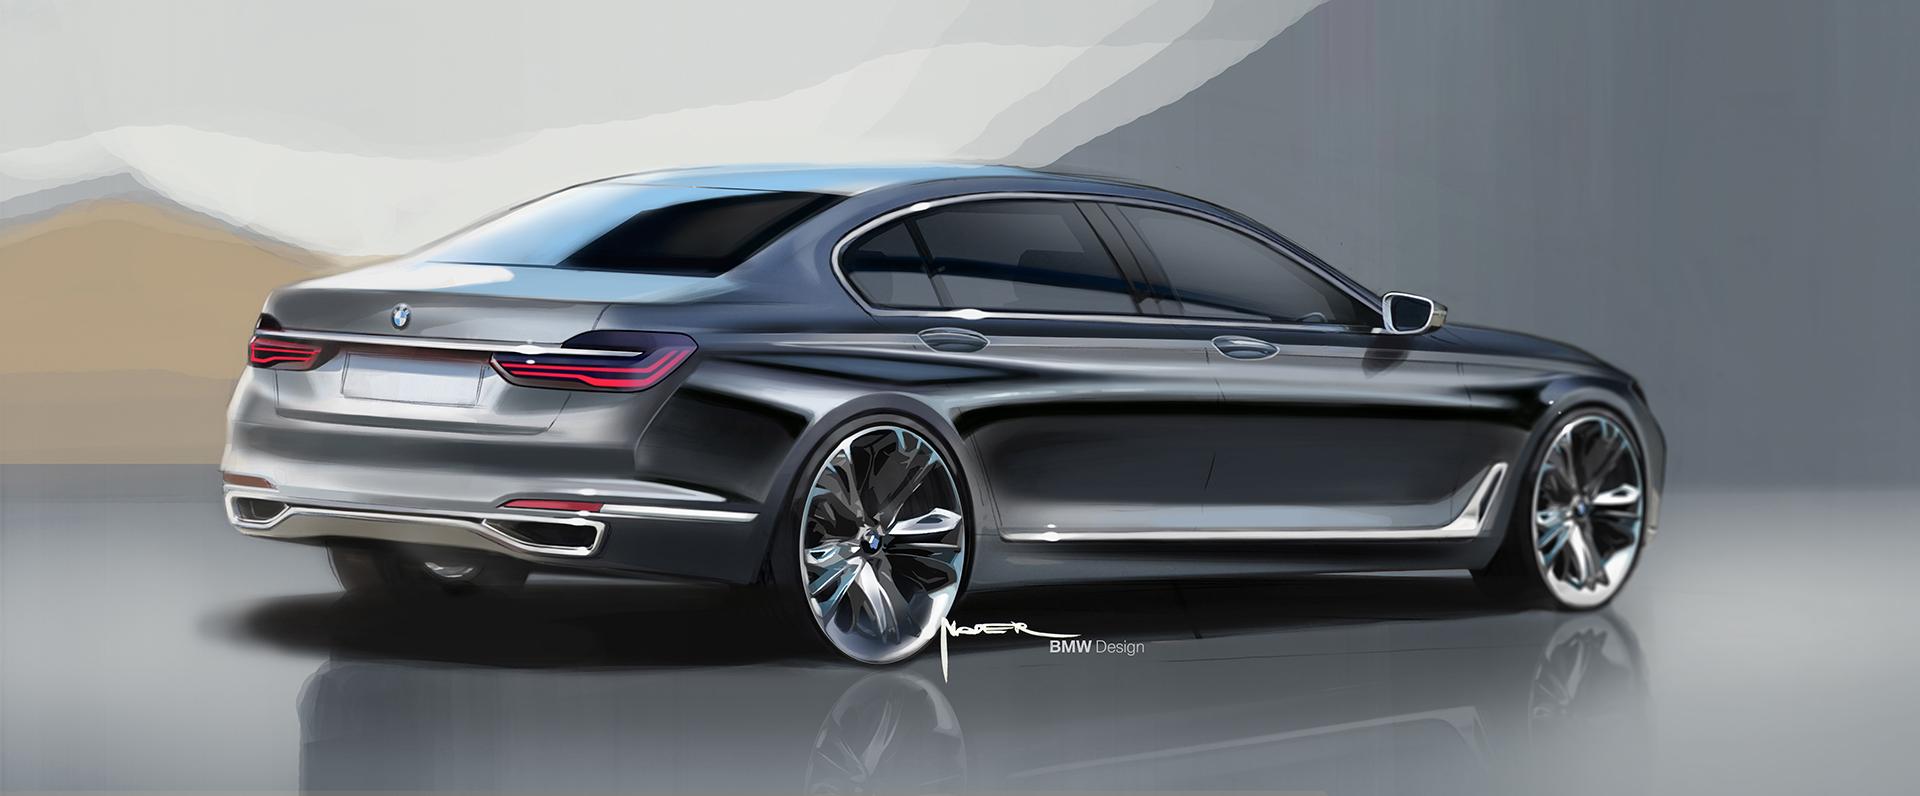 BMW 7 series - 2016 - sketch - profil arrière / rear